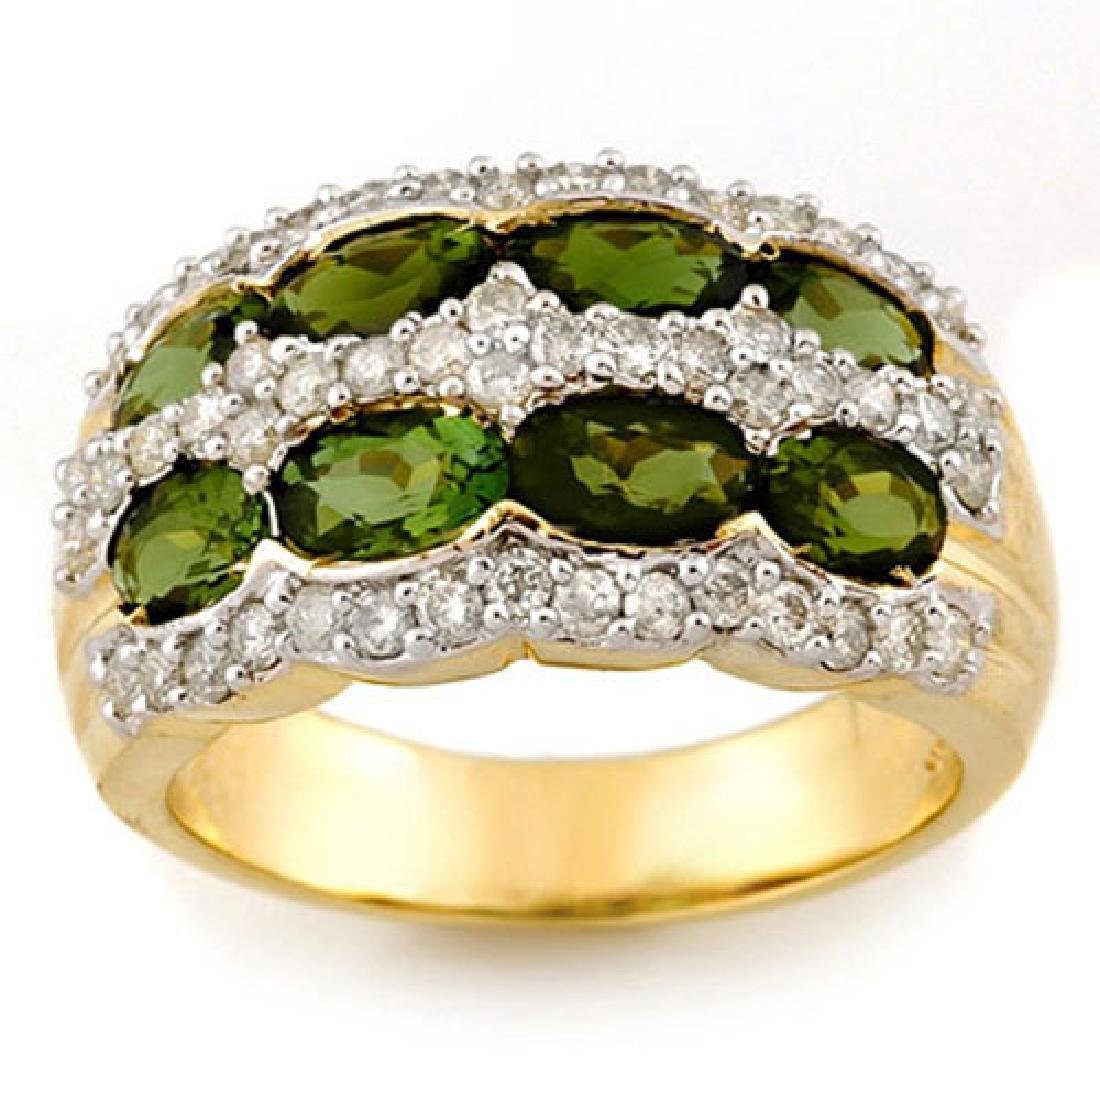 3.0 CTW Green Tourmaline & Diamond Ring 14K Yellow Gold